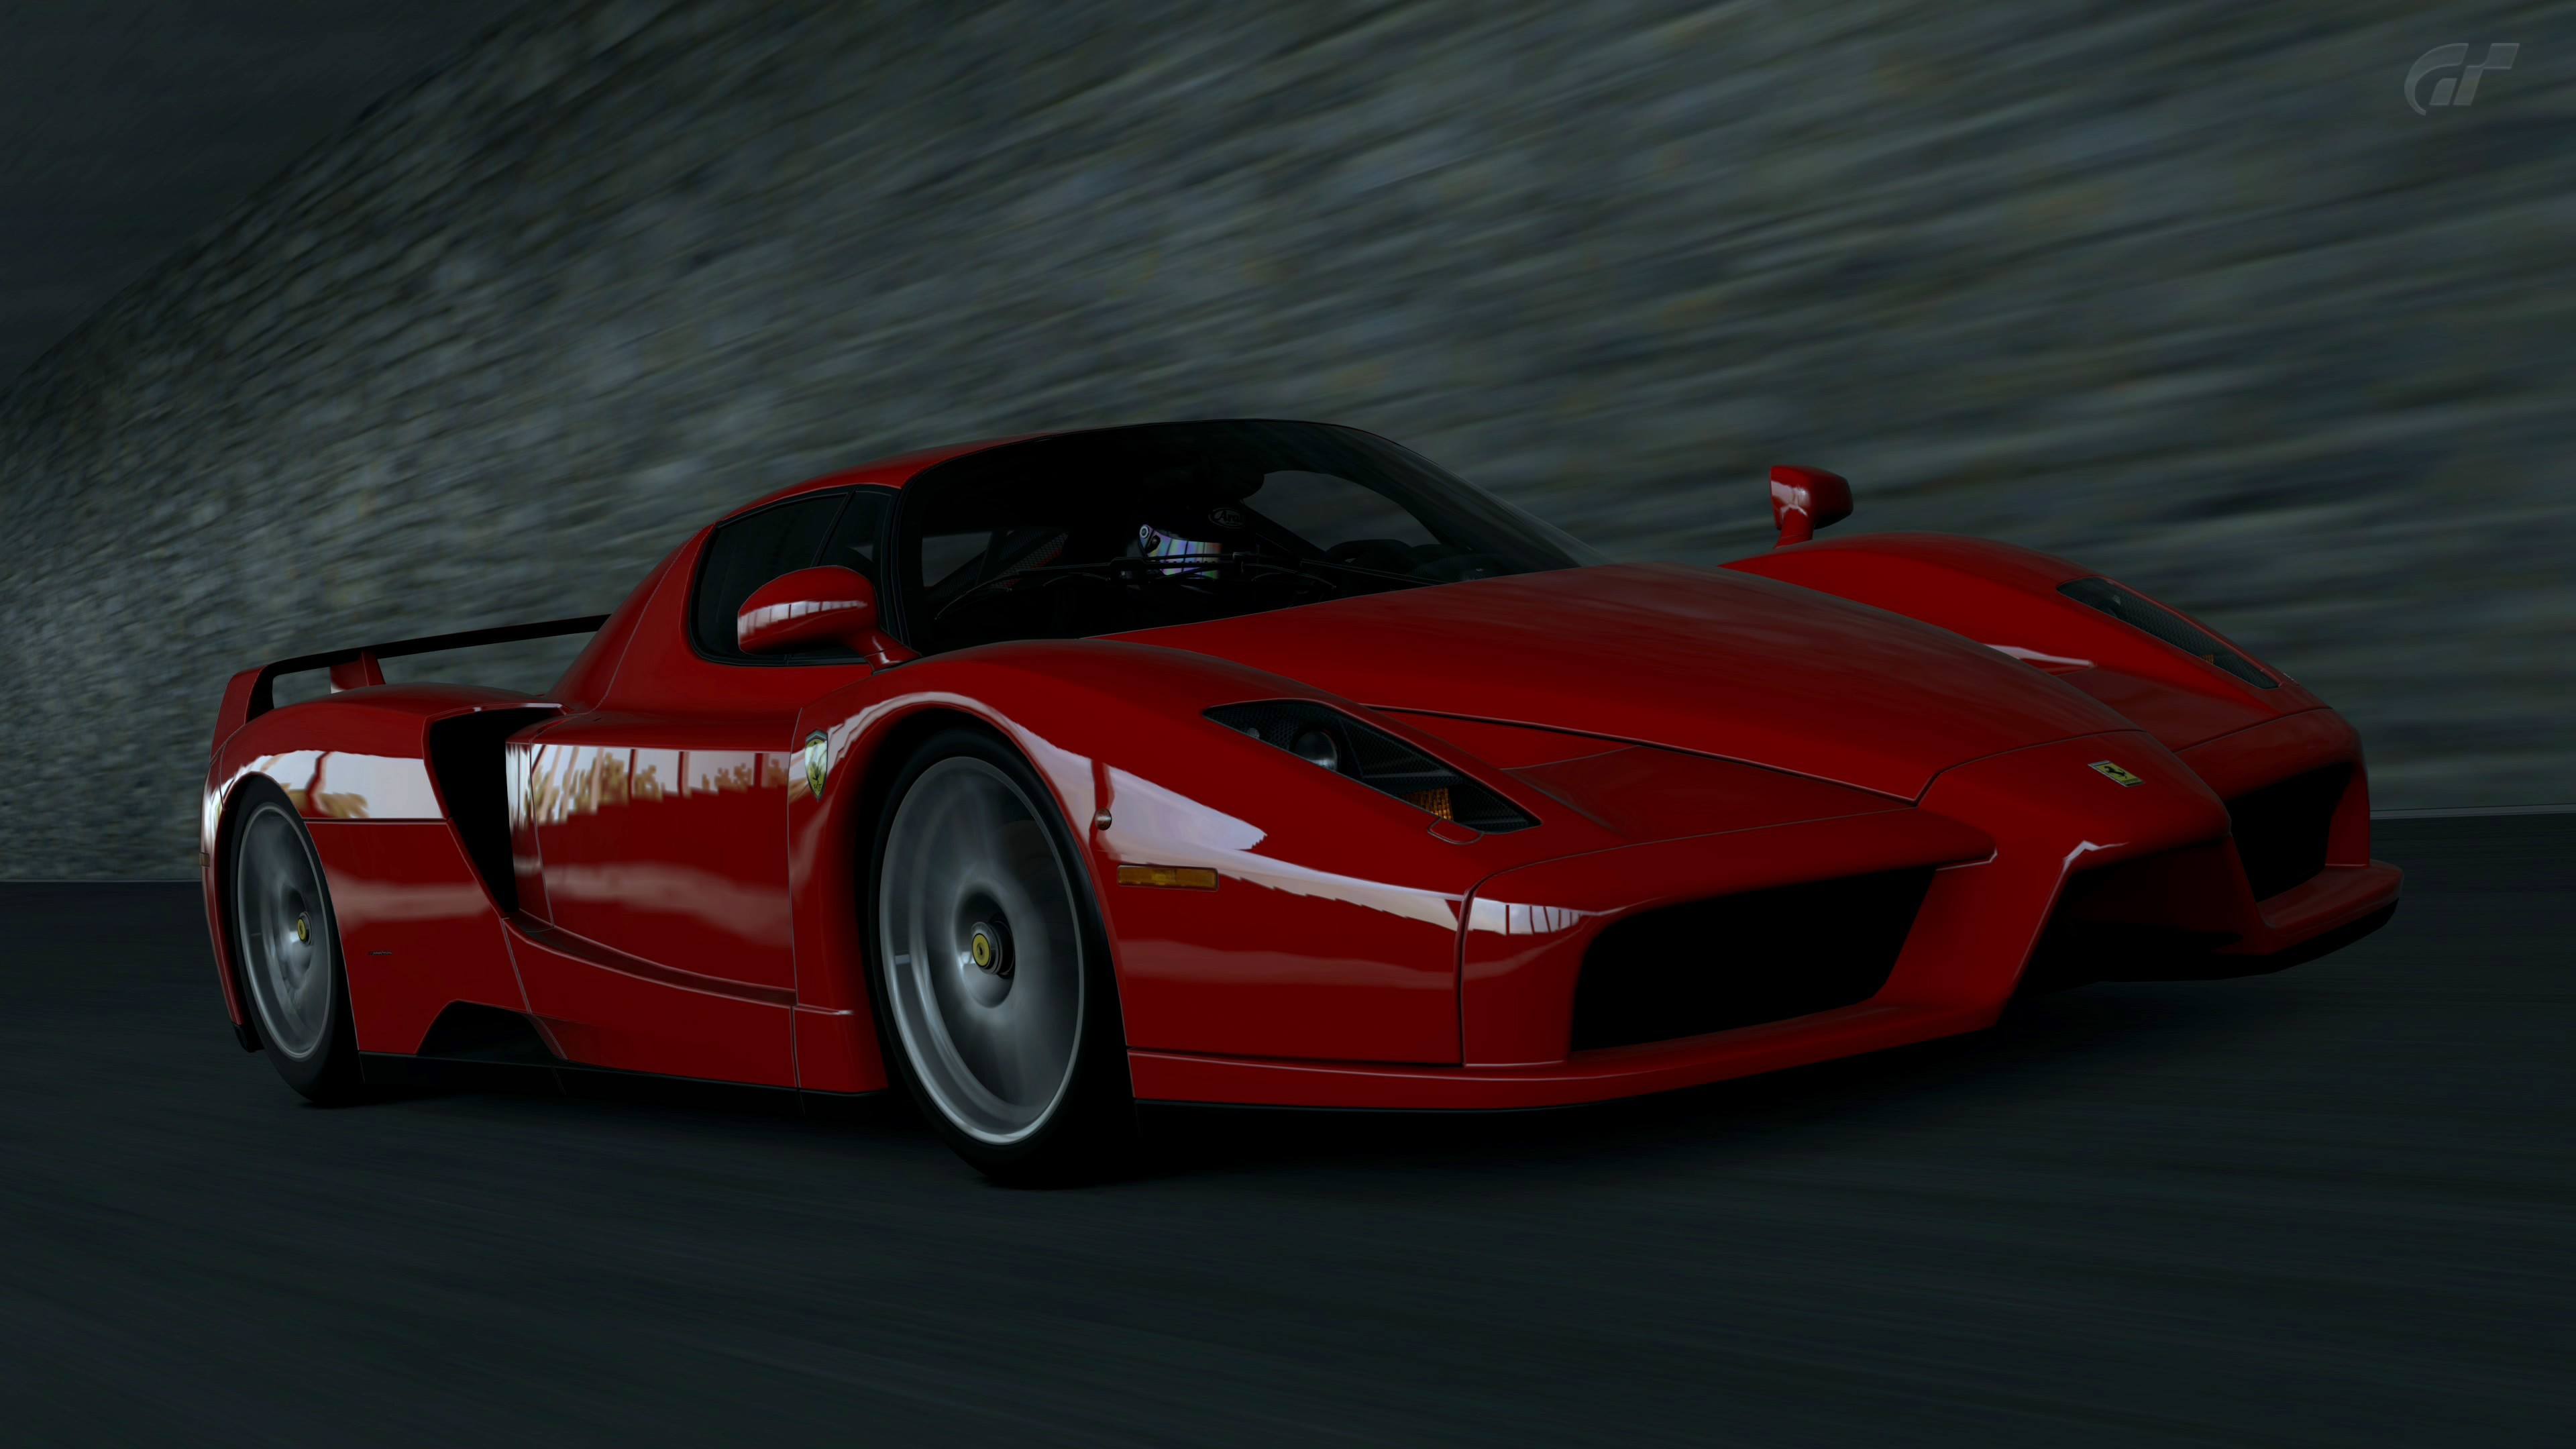 1920x1080 Ferrari Enzo Side Fire Abstract Car 2014 HD